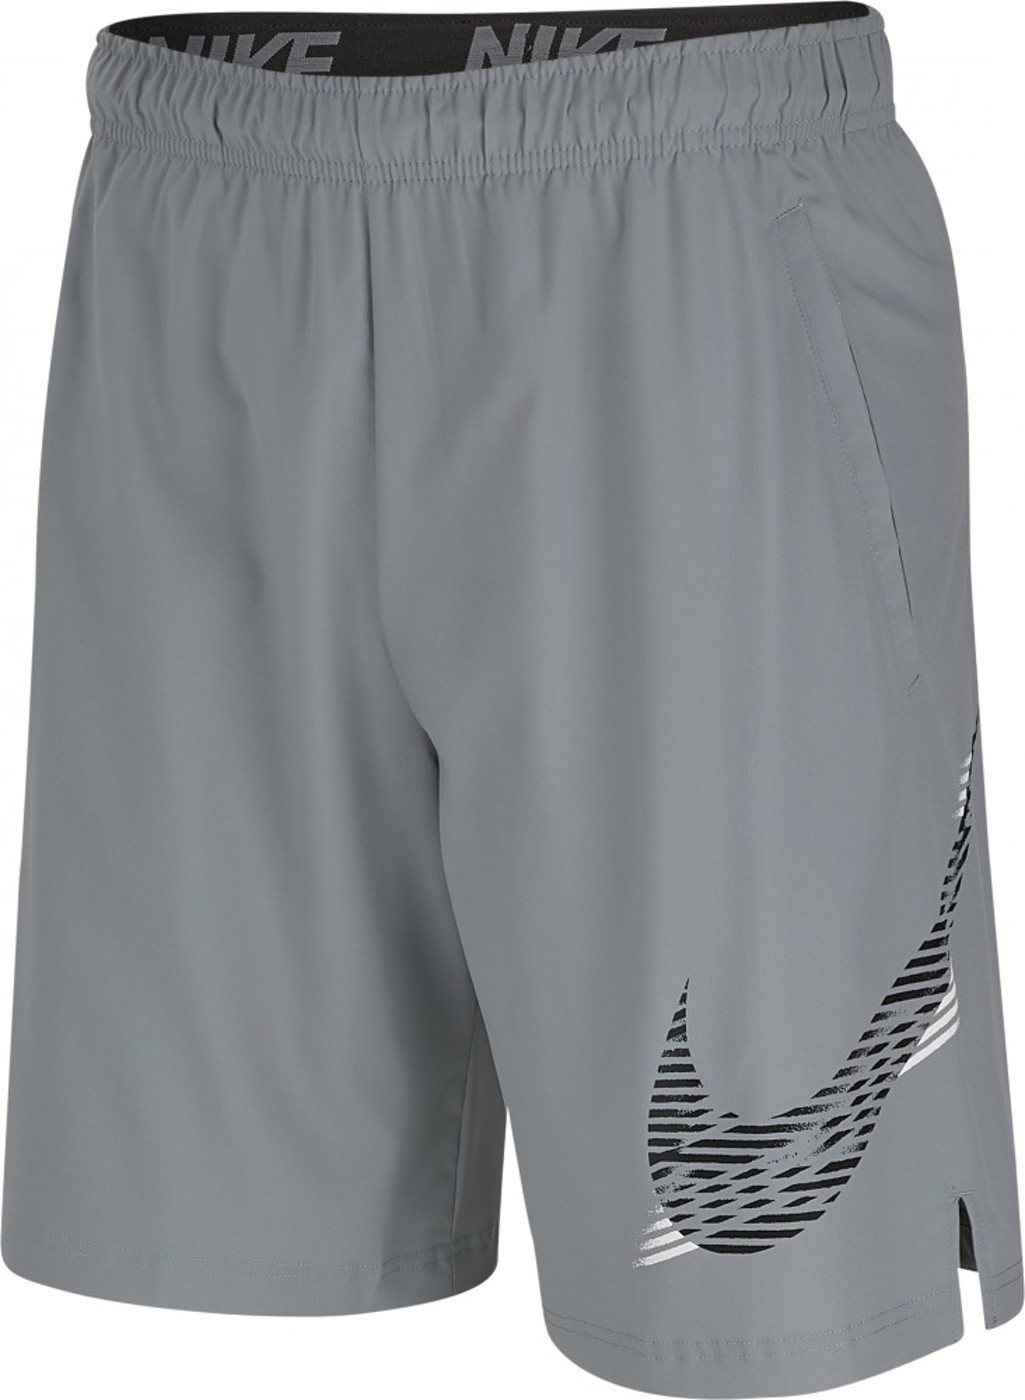 "Nike Flex 8"" Graphic Tra - Herren"